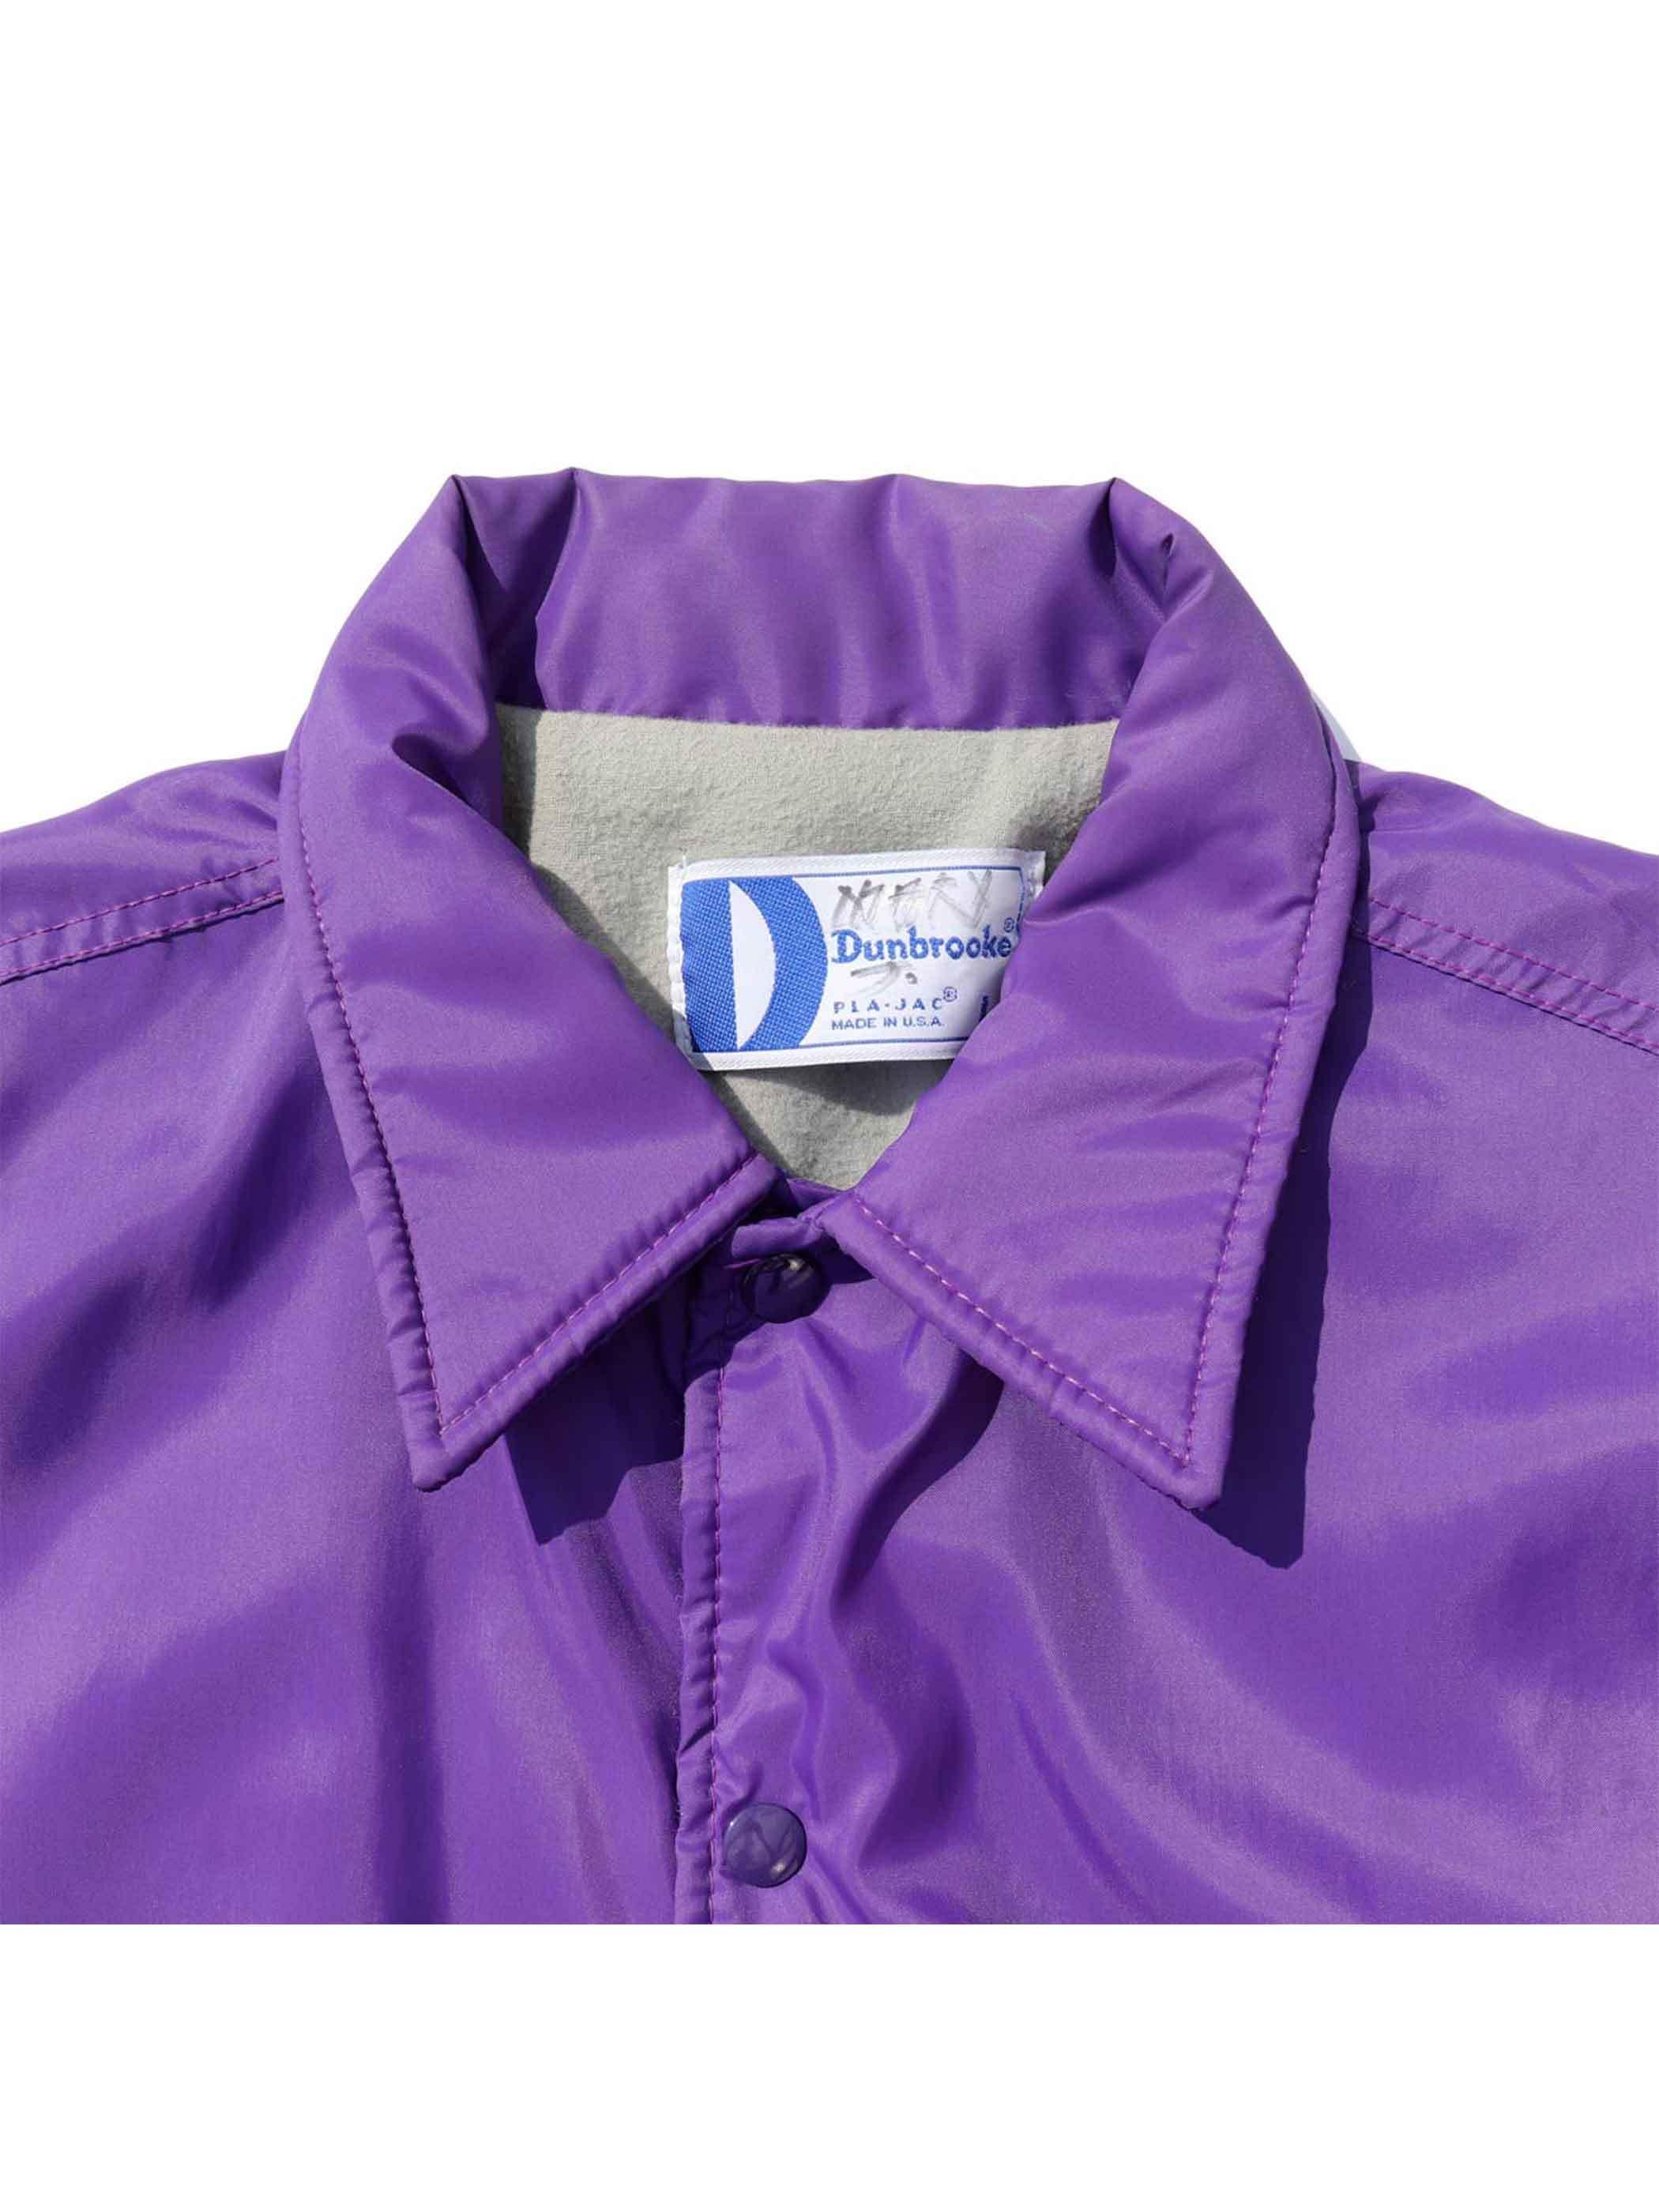 90's DUNBROOKE USA製 ナイロンコーチジャケット [L]